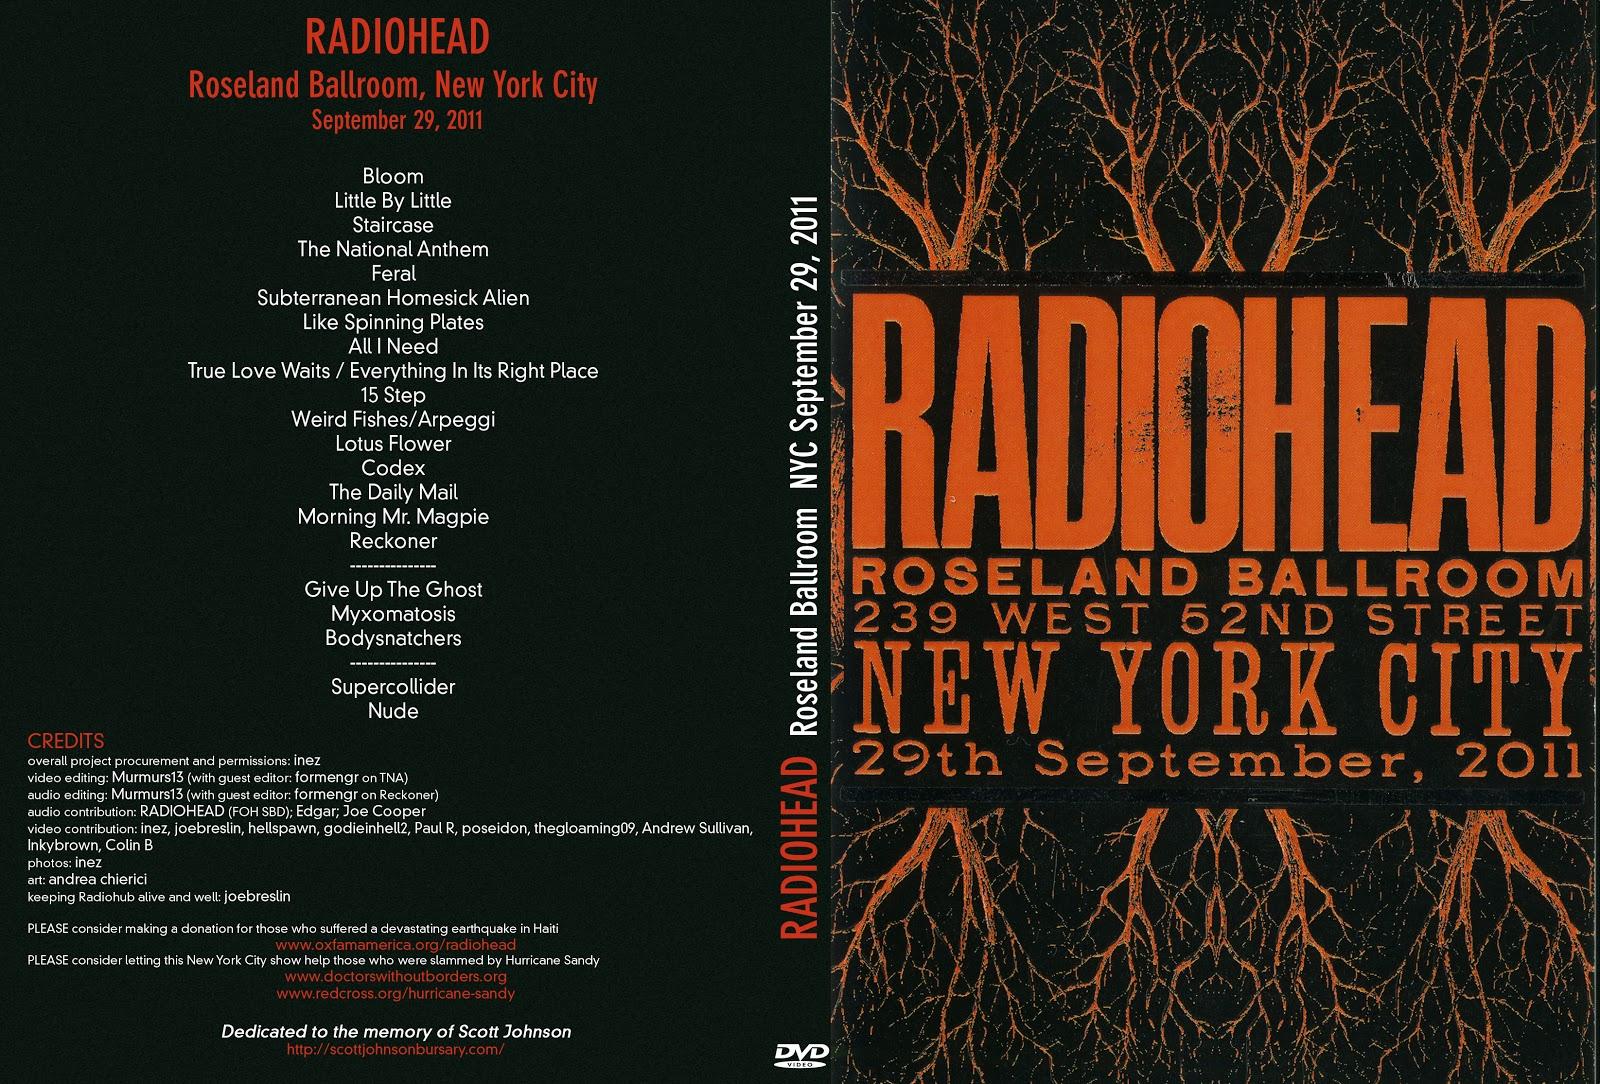 Watch a fan made Radiohead concert film